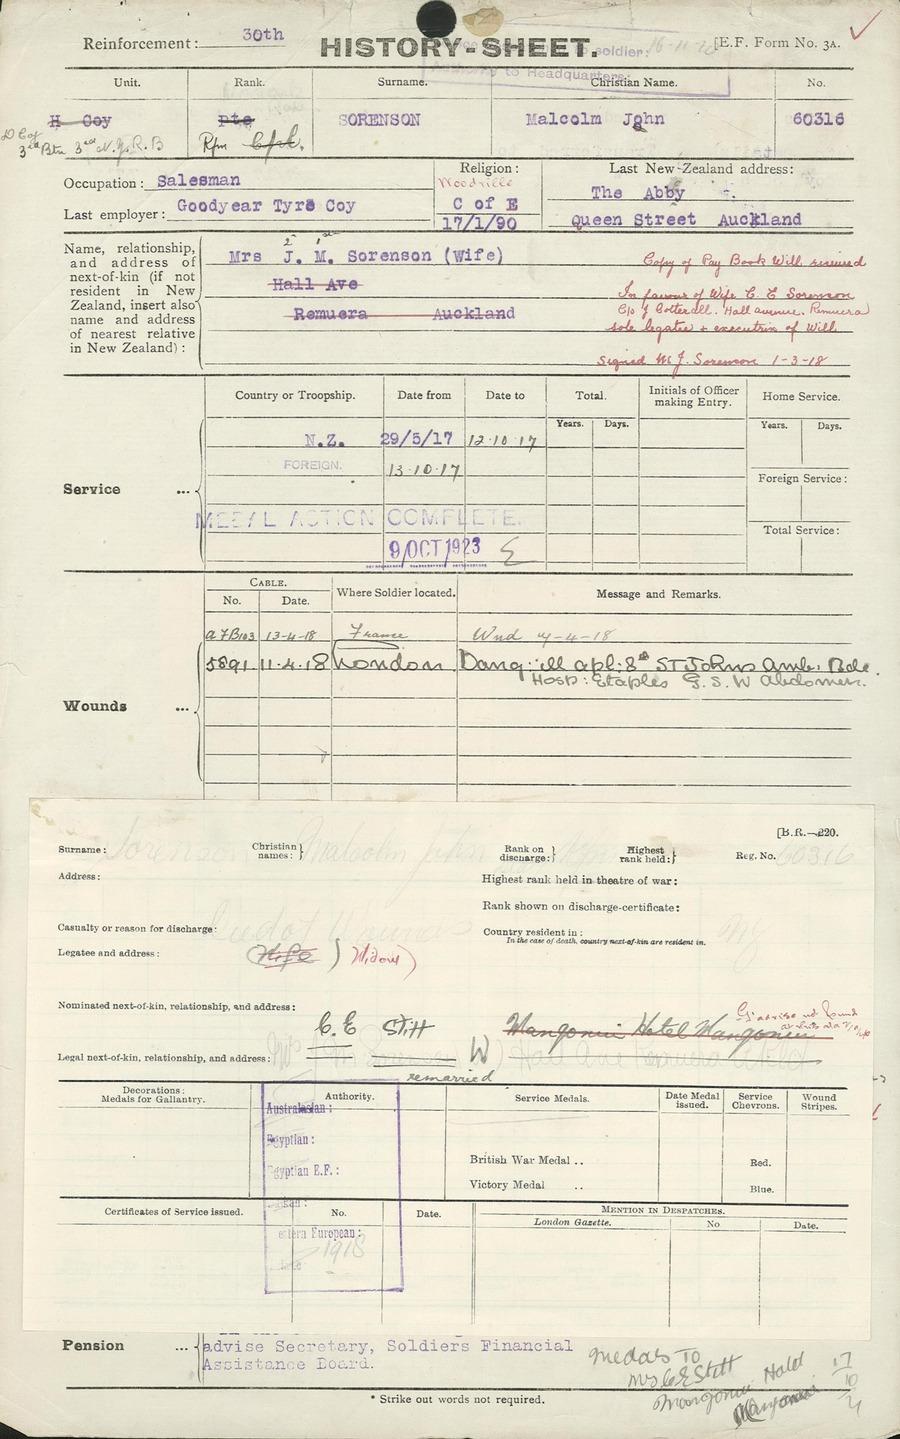 SORENSON, Malcolm John - WW1 60316 - Army